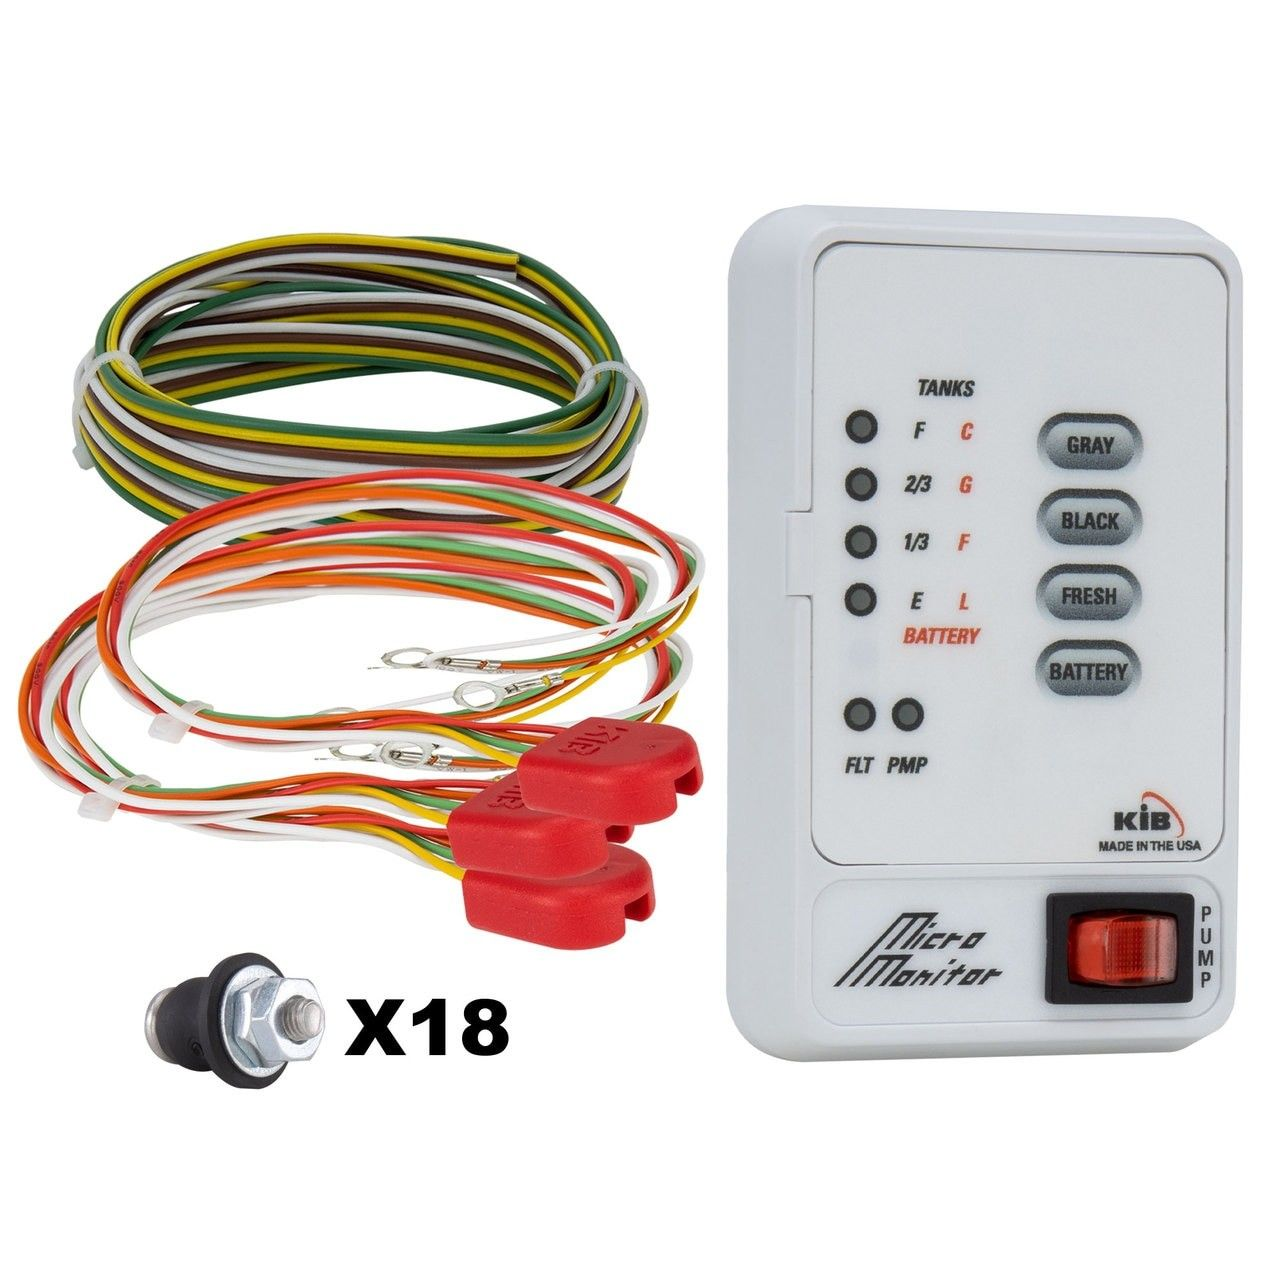 Kib K24wnb Monitor Panel Installation Guide In 2020 Monitor Panel Systems Level Sensor